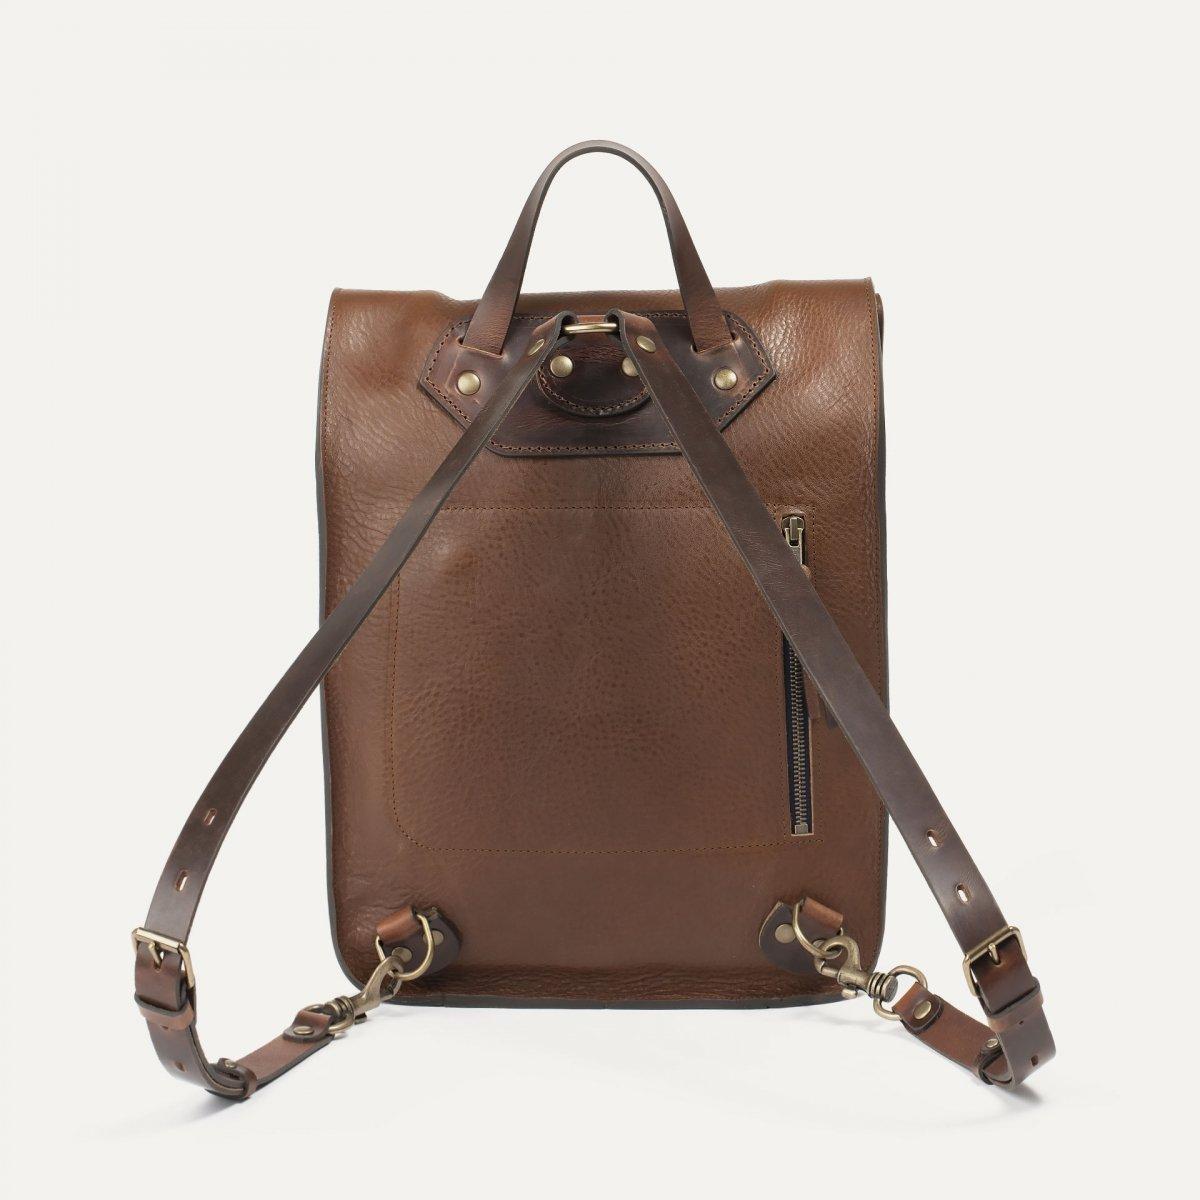 Puncho leather backpack - Cuba Libre / E Pure (image n°2)